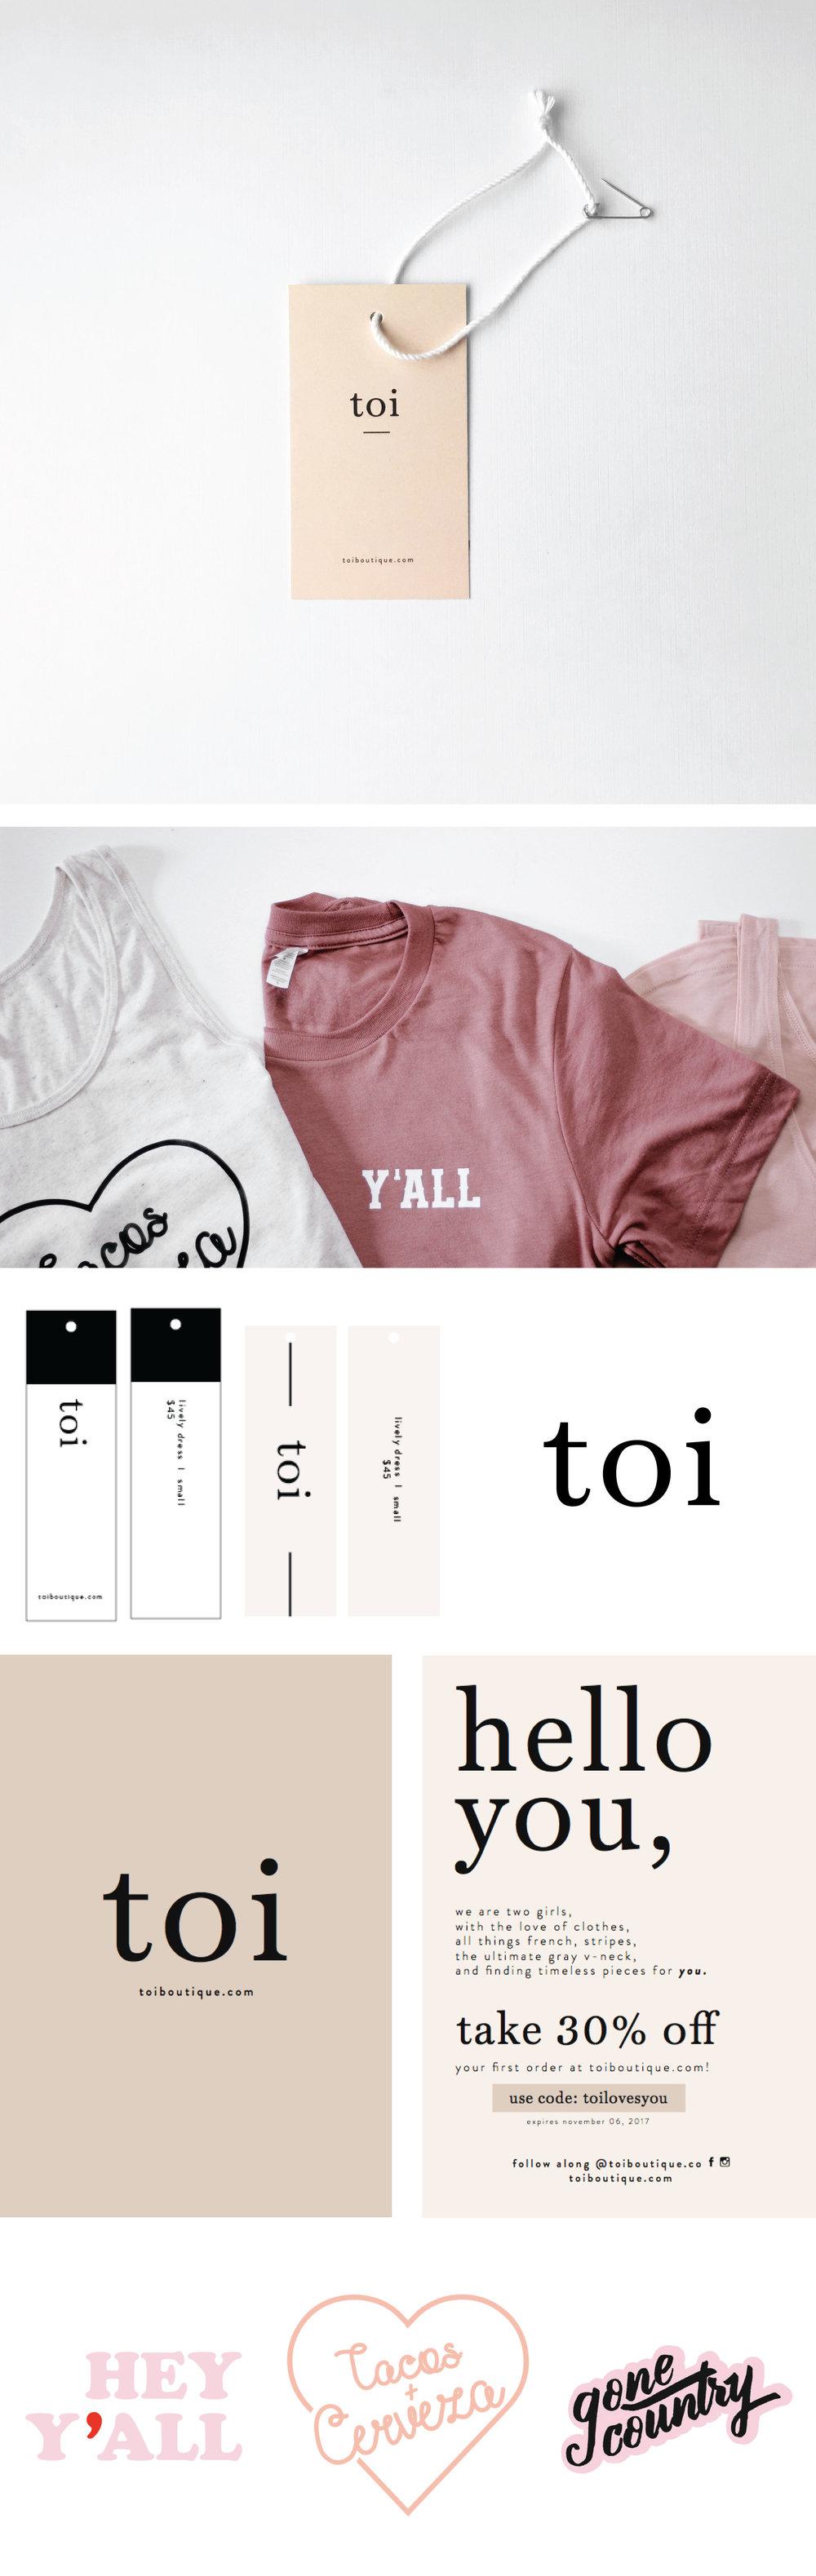 TOI-brand.jpg